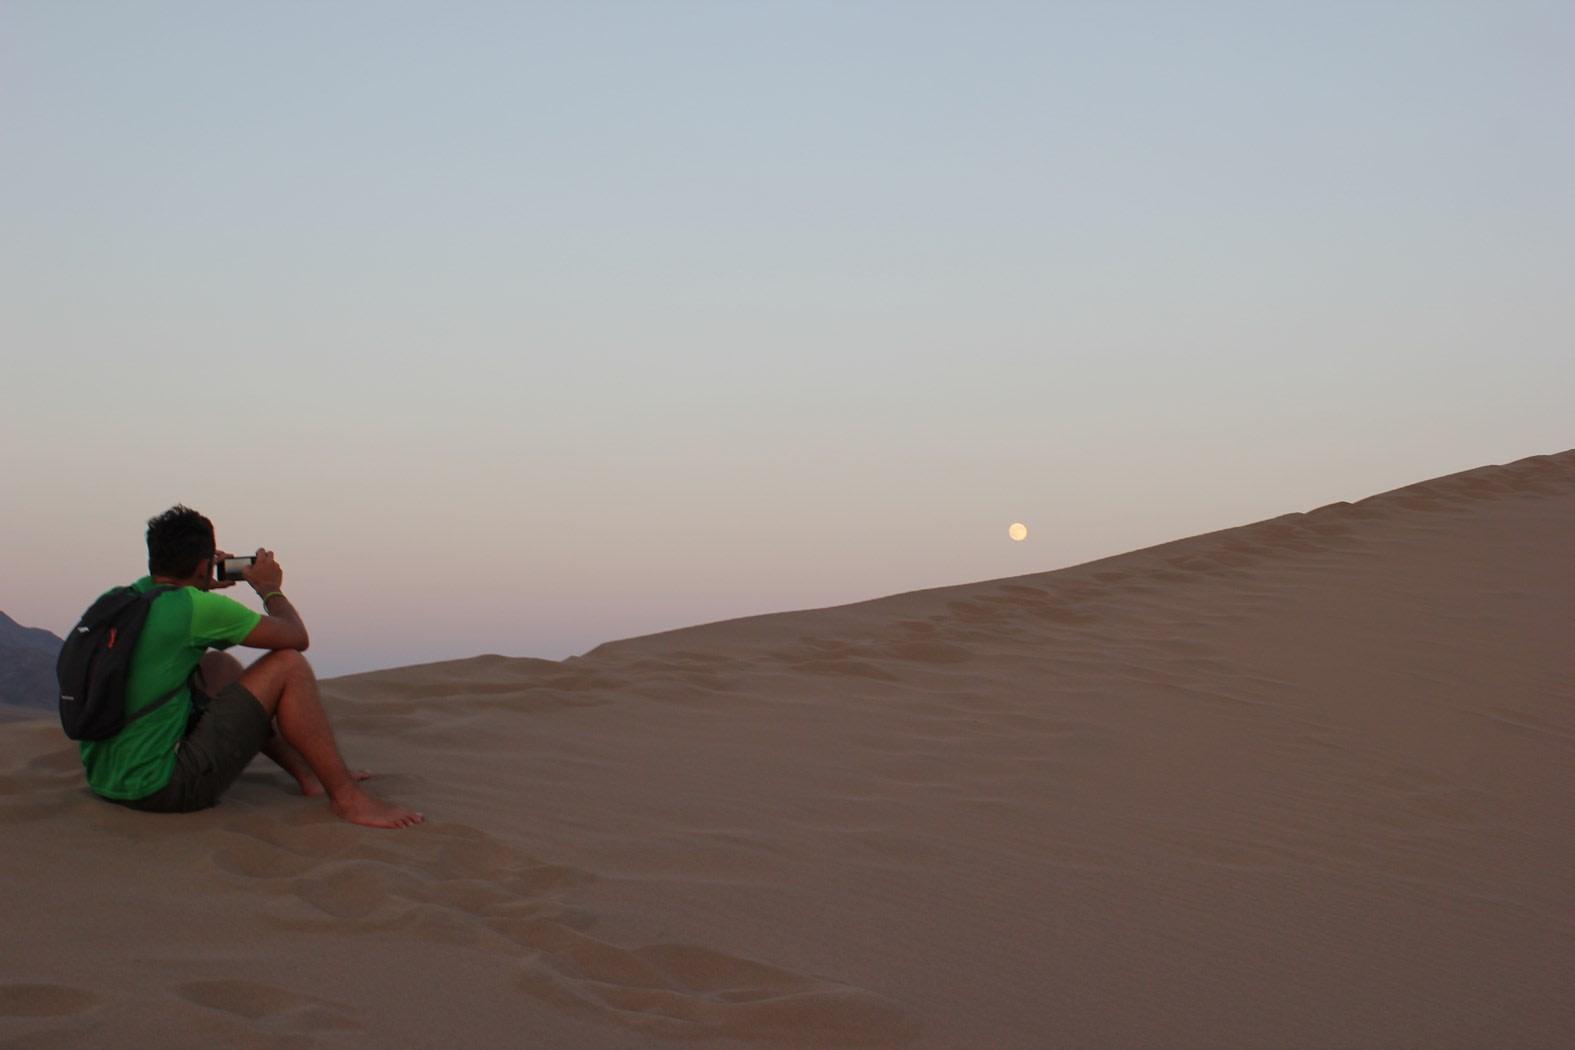 Sunset at Altyn Emel National Park, Kazakhstan